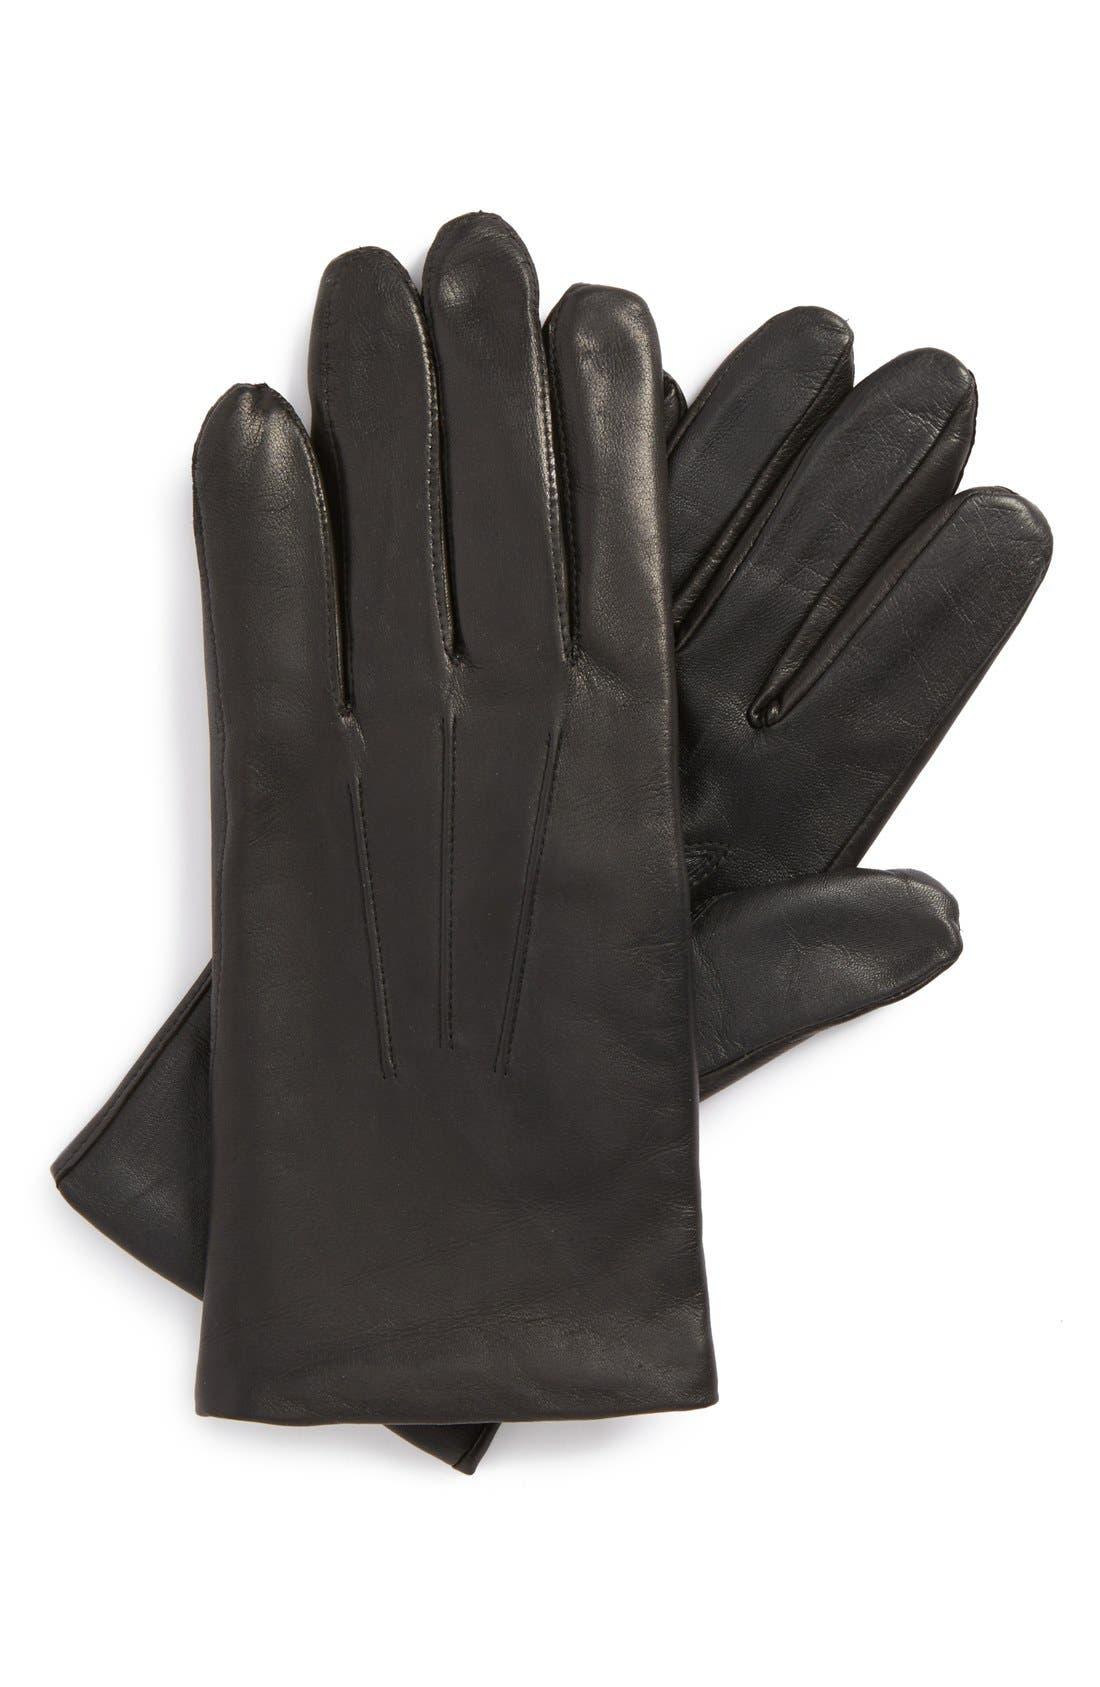 Leather Tech Gloves,                             Main thumbnail 1, color,                             Black